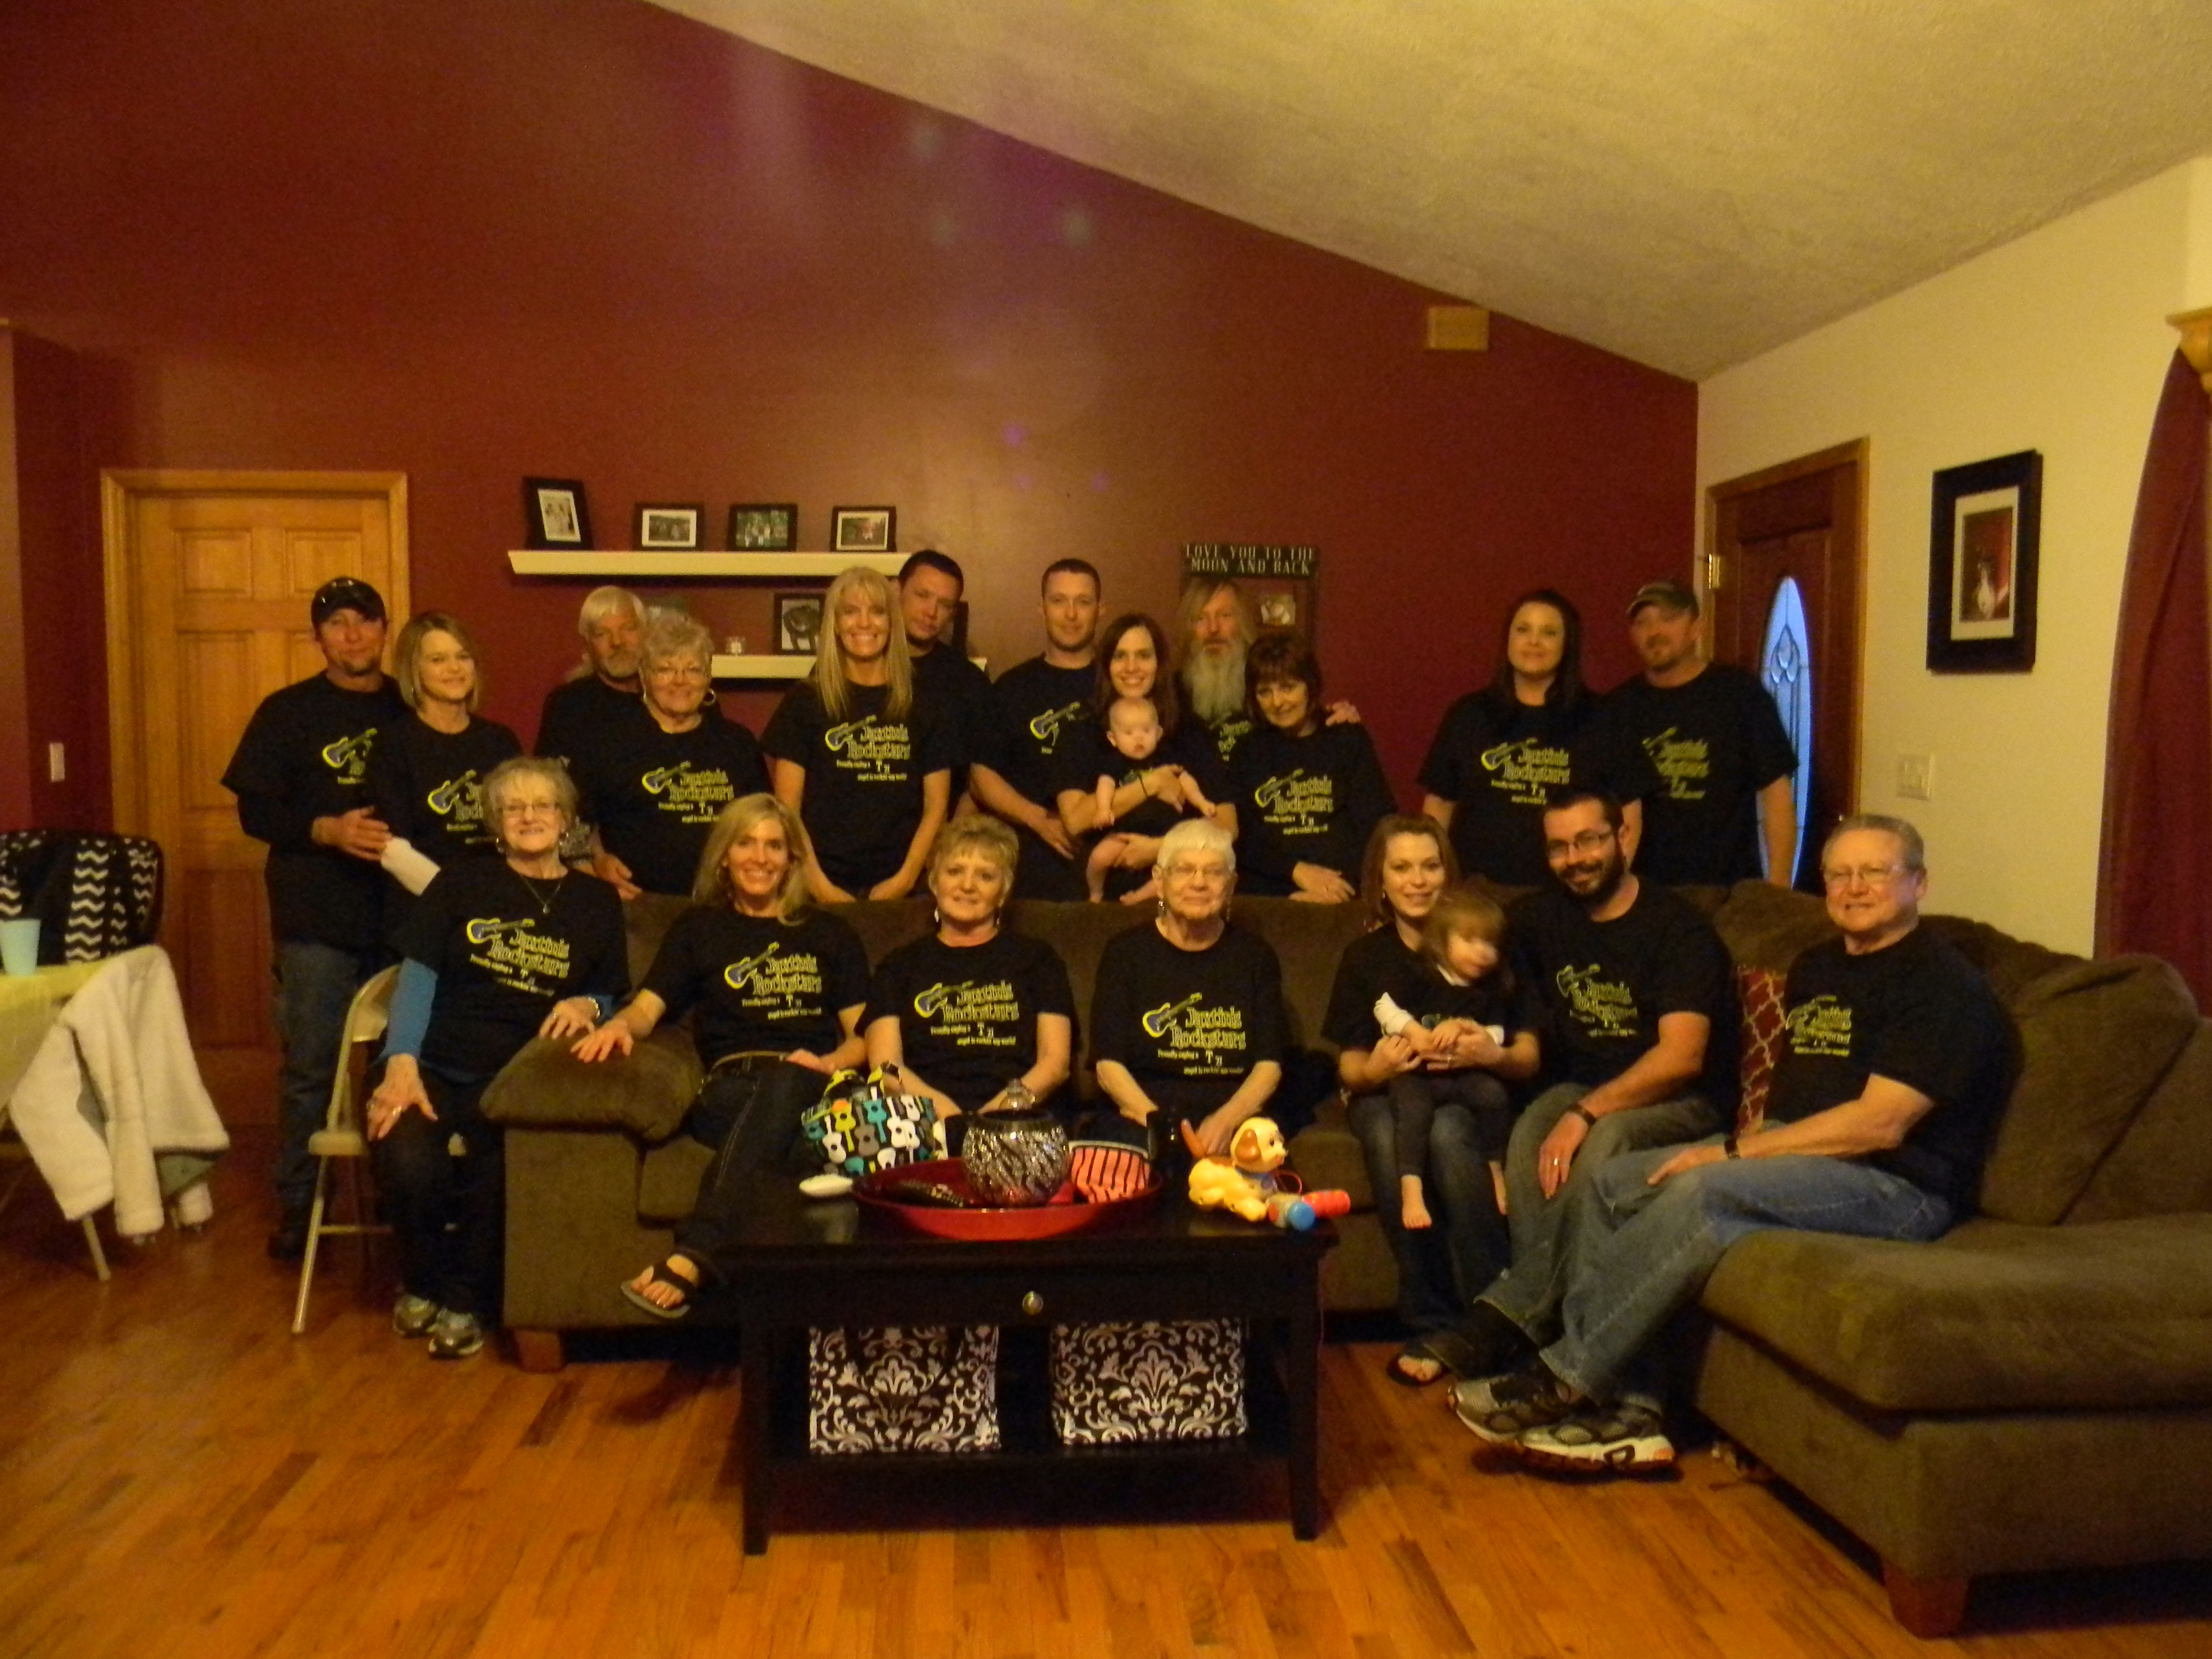 Shirt design jacksonville fl - Jaxtin S Rockstars World Down Syndrome Day T Shirt Photo